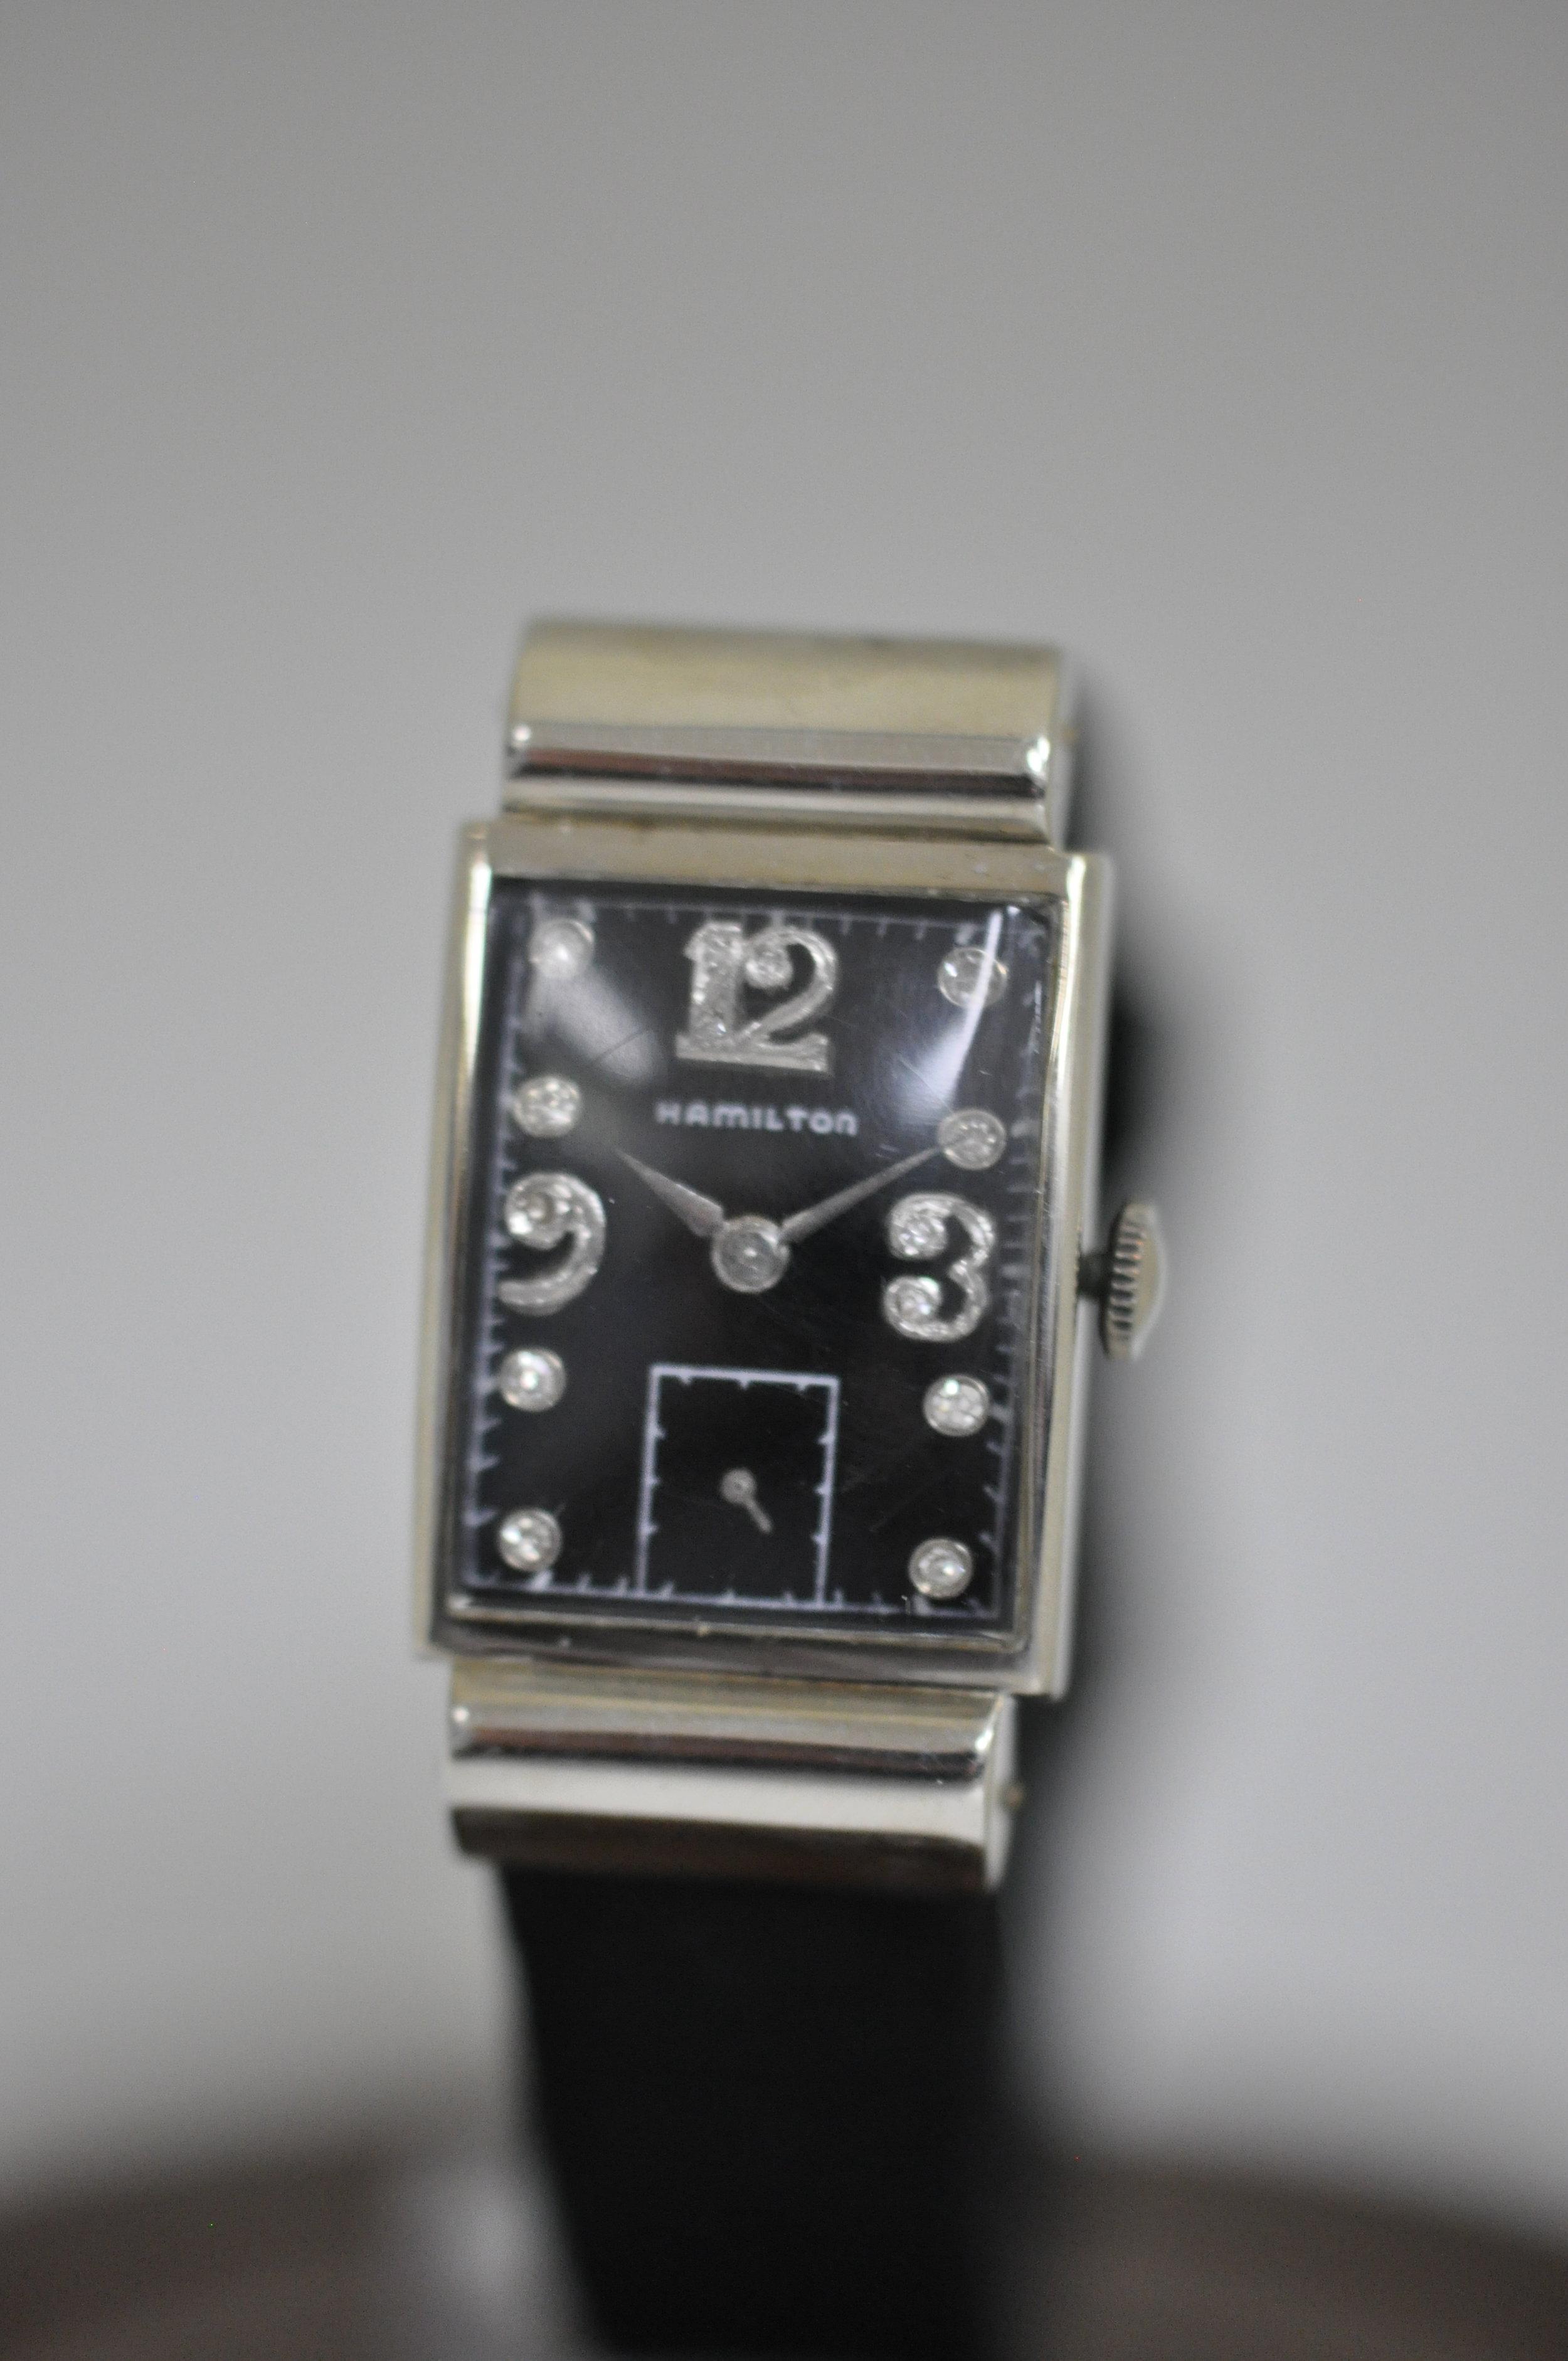 Hamilton 14K Men's Wrist Watch